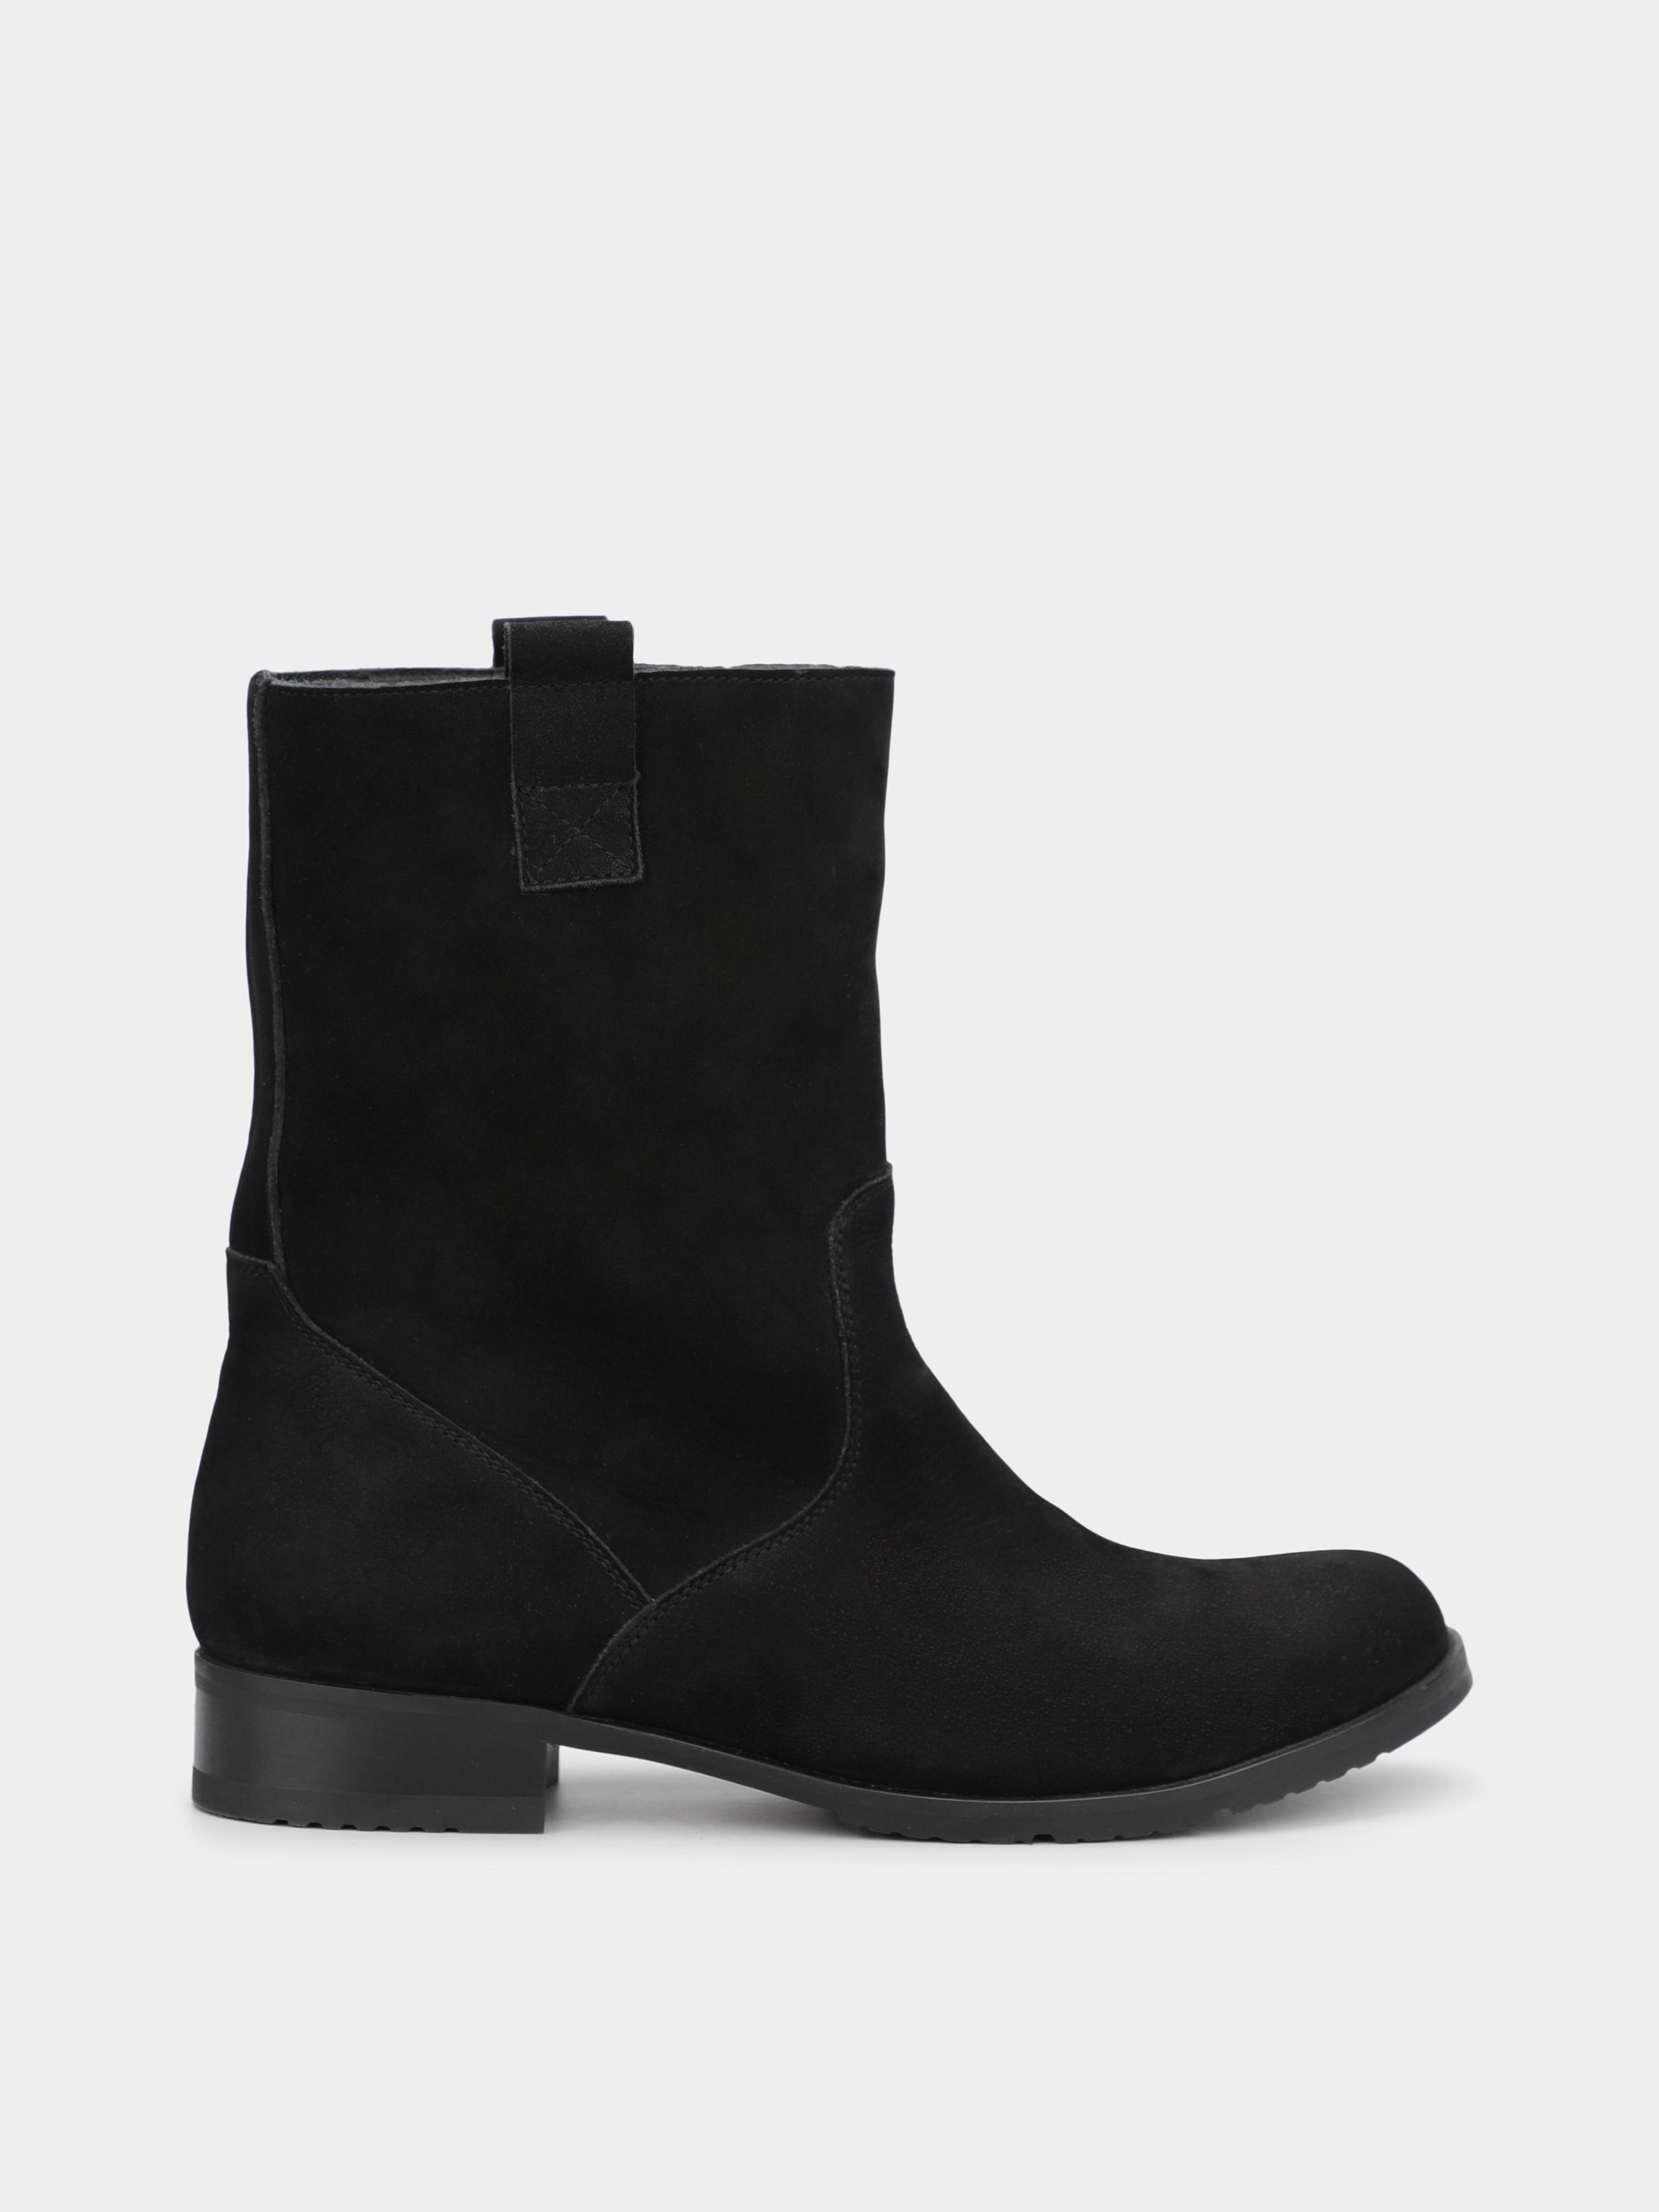 Ботинки для женщин TUTO 6L40 купить онлайн, 2017